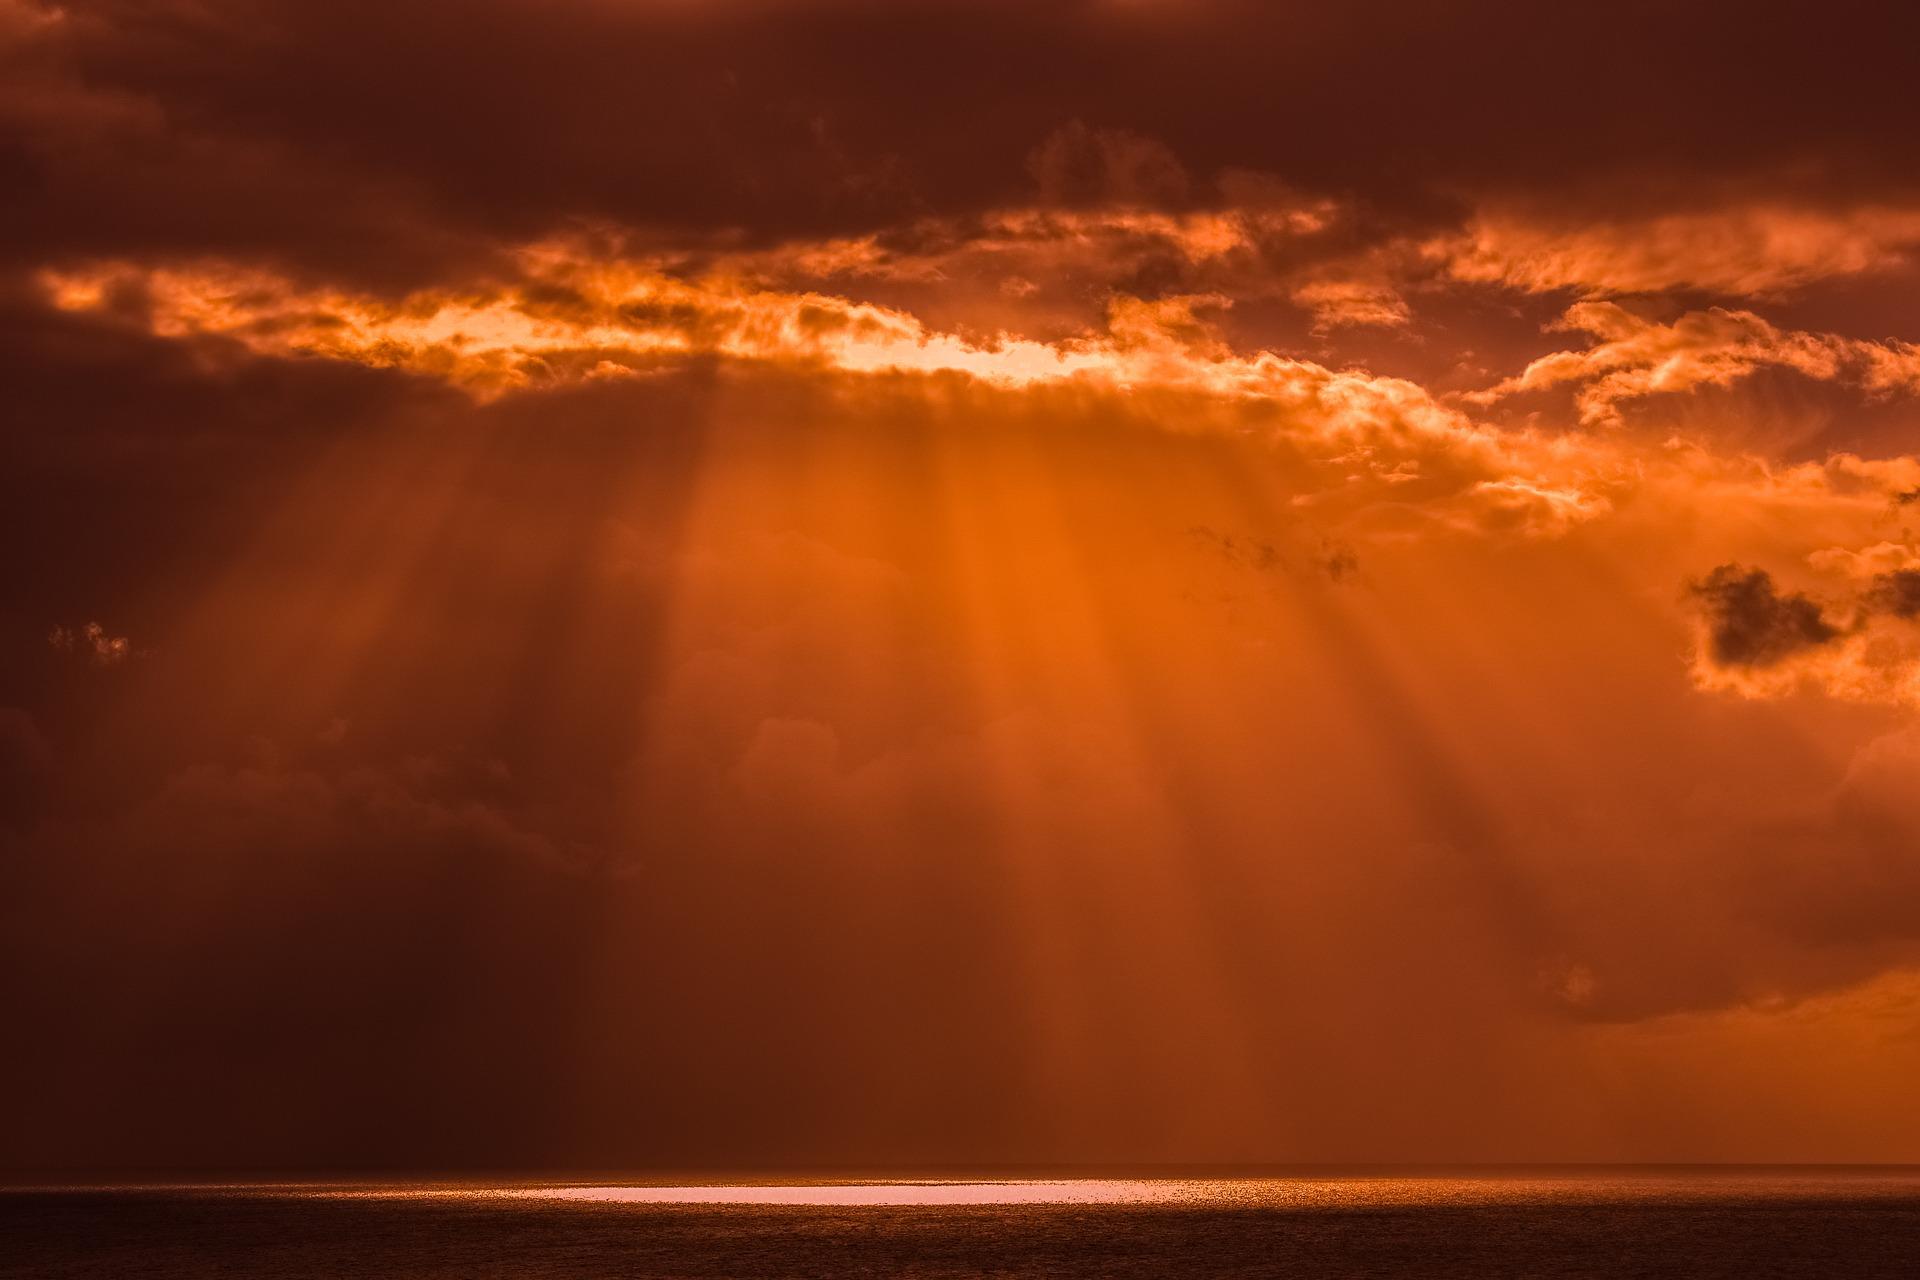 sunset-3054191_1920